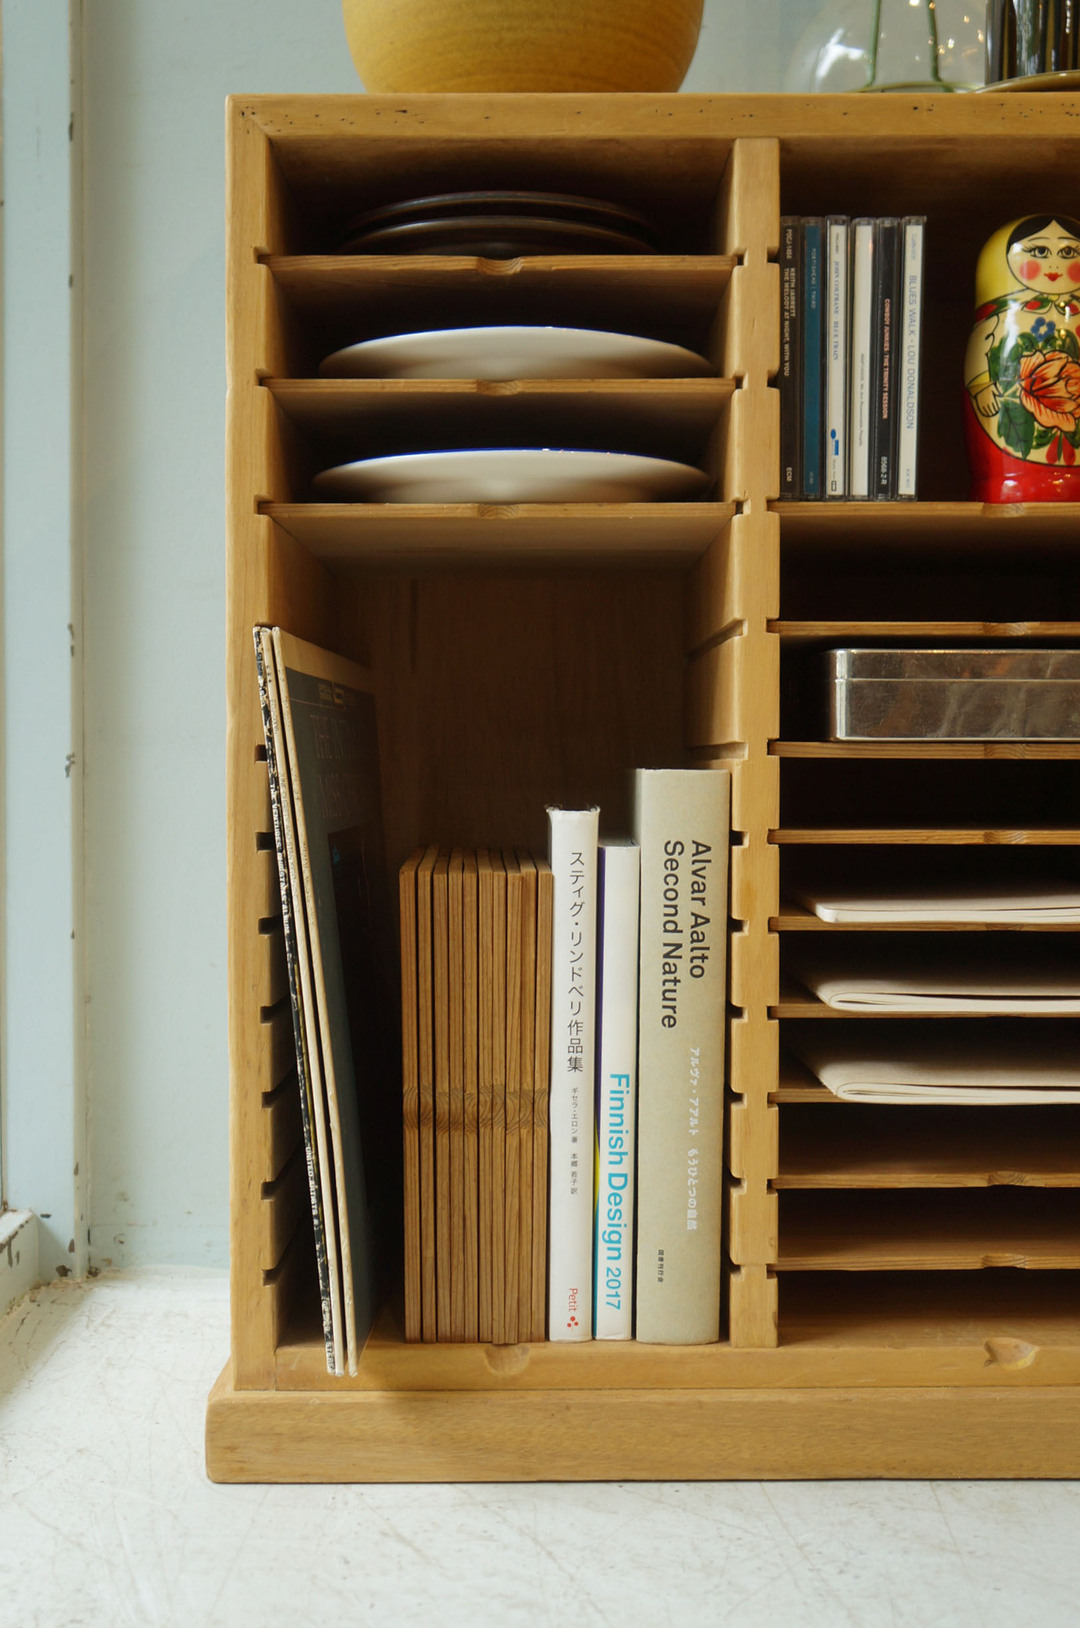 Japanese Vintage Medical Record Case/ジャパンヴィンテージ カルテケース 収納ボックス レトロ 古道具 シャビーシック